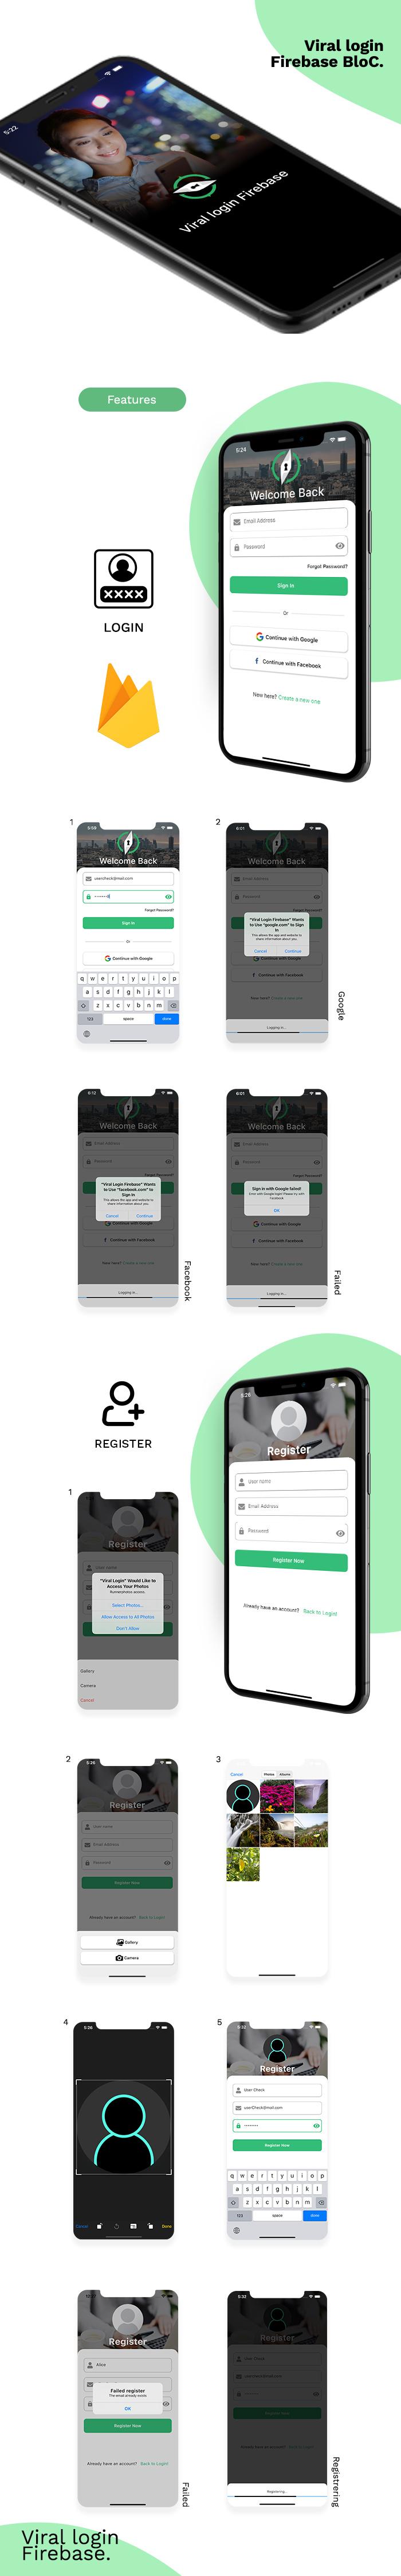 Viral Login Firebase BloC Full App - 1